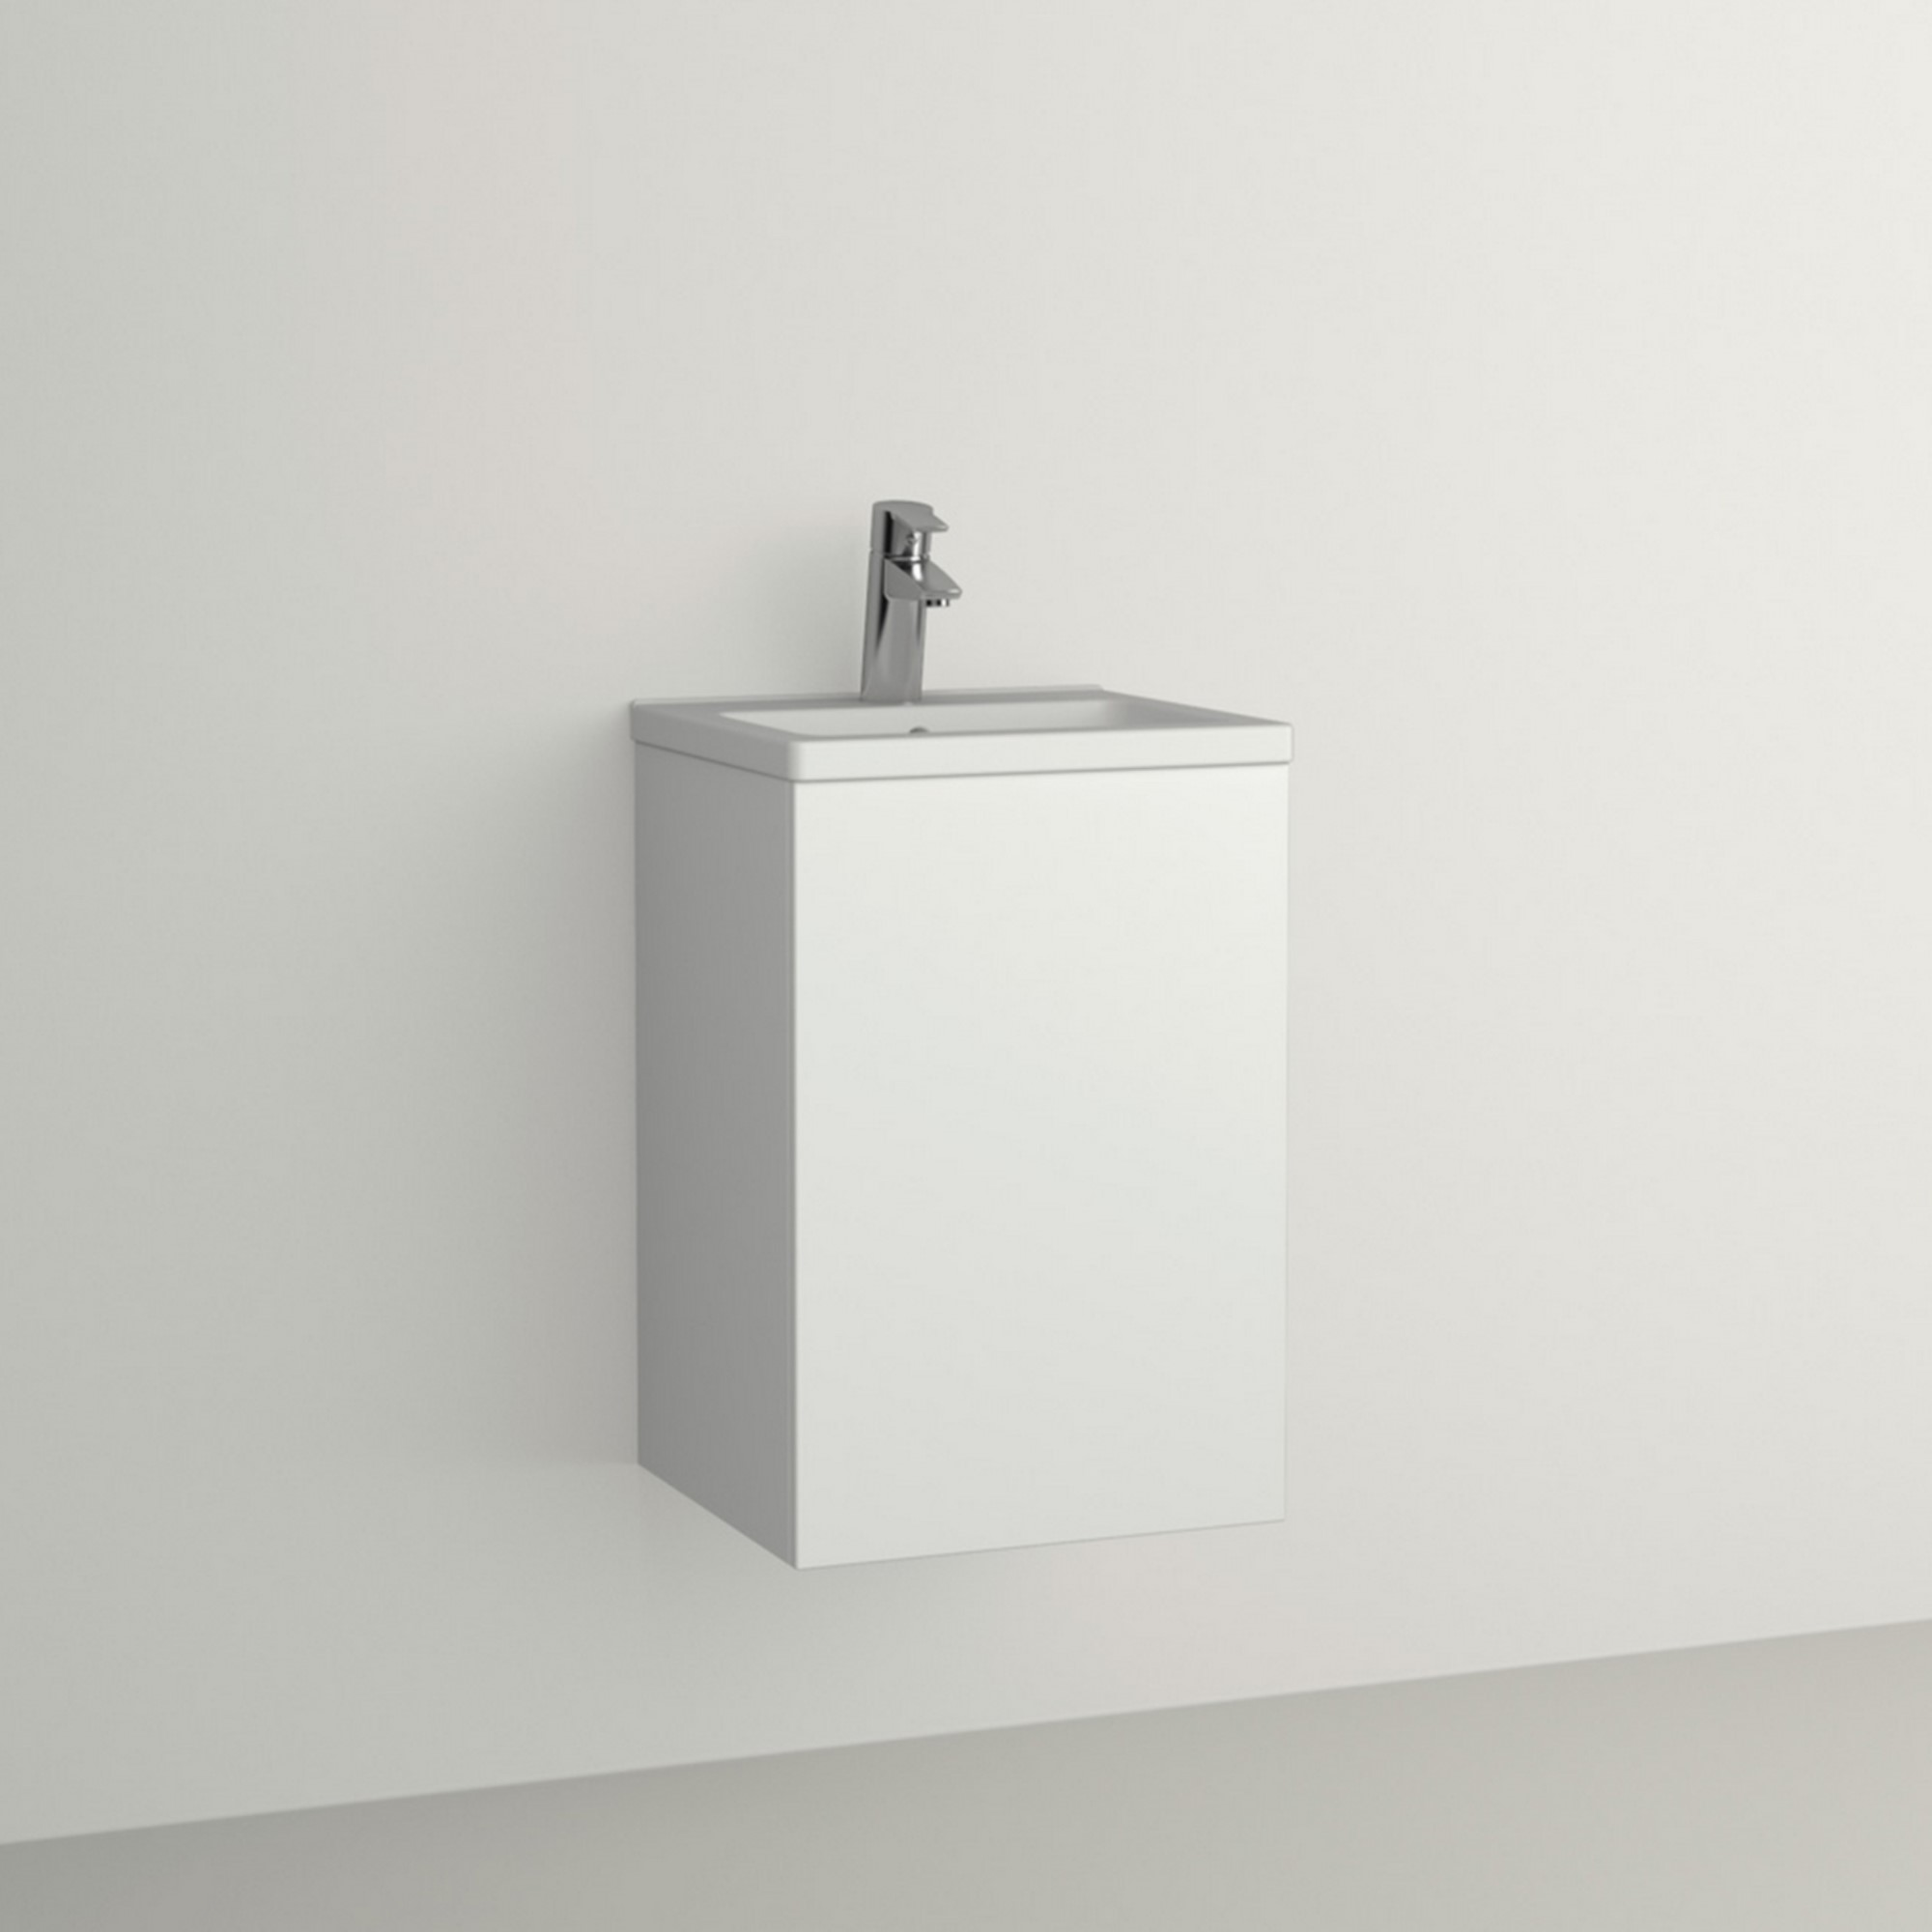 Tvättställsskåp Vedum Free 415